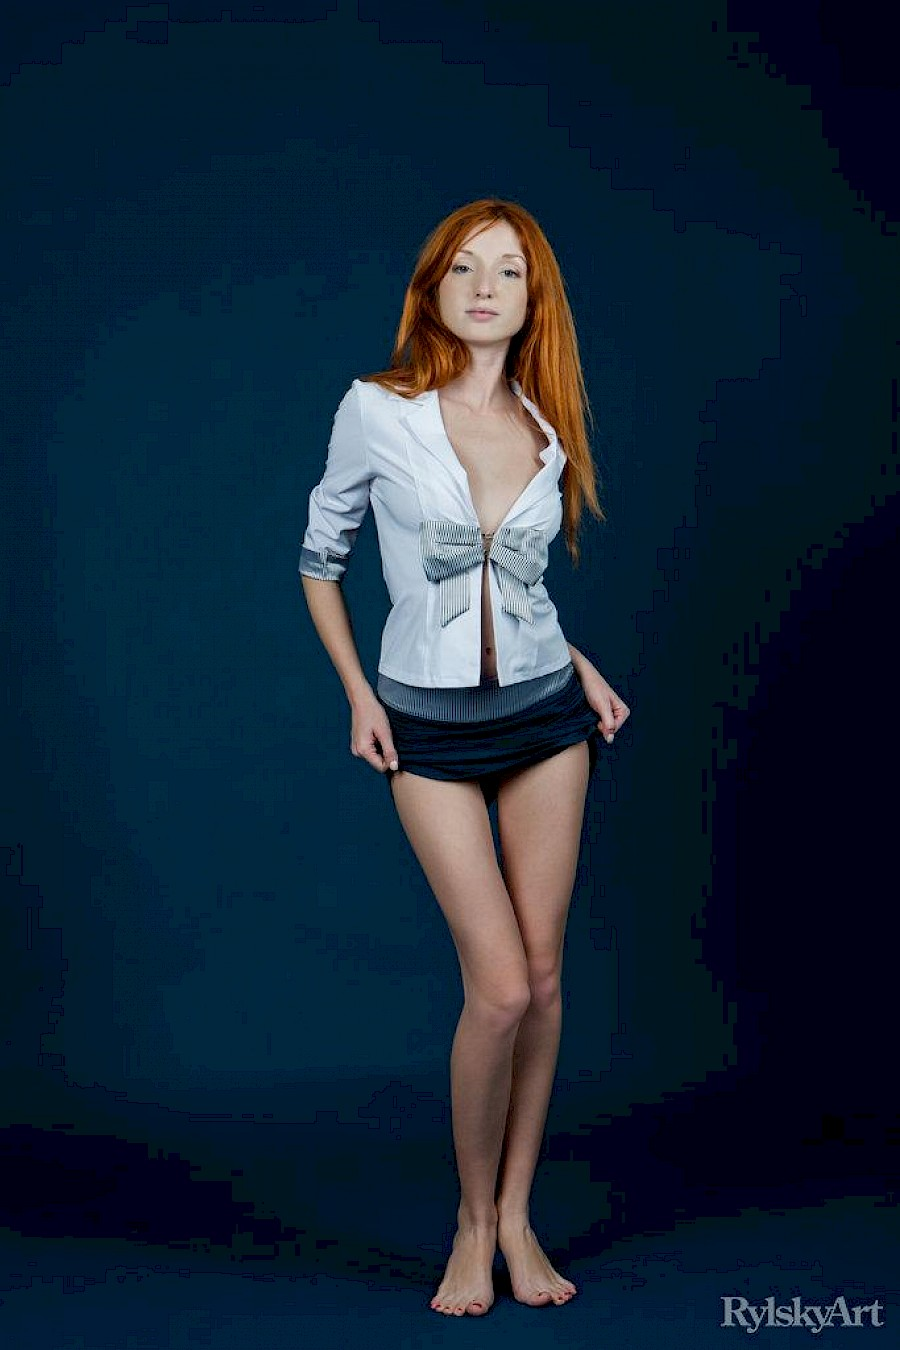 Redhead stripping nude nice